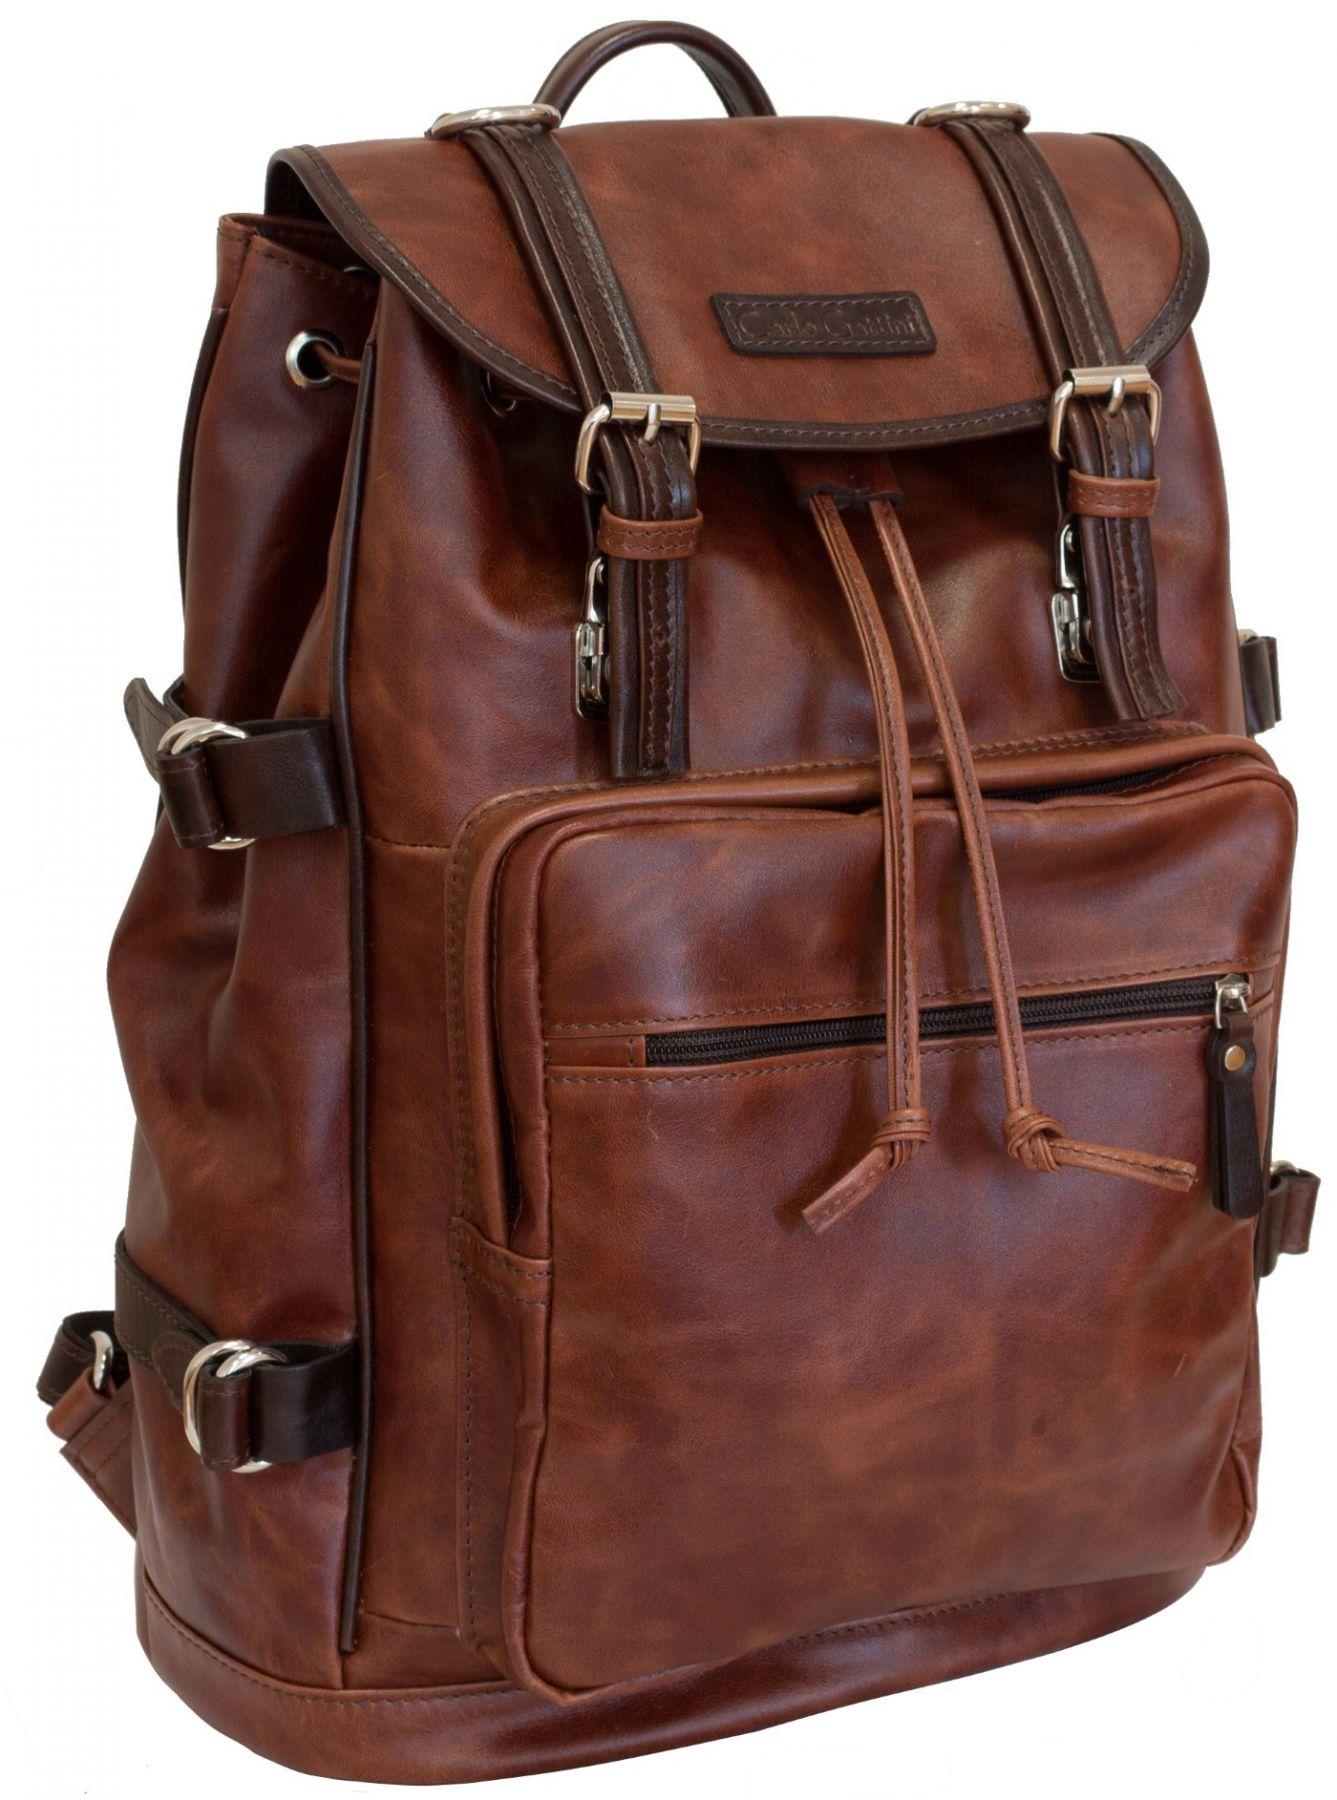 c9273efa6922 Кожаный рюкзак Carlo Gattini Volturno cognac/brown. ‹ ›